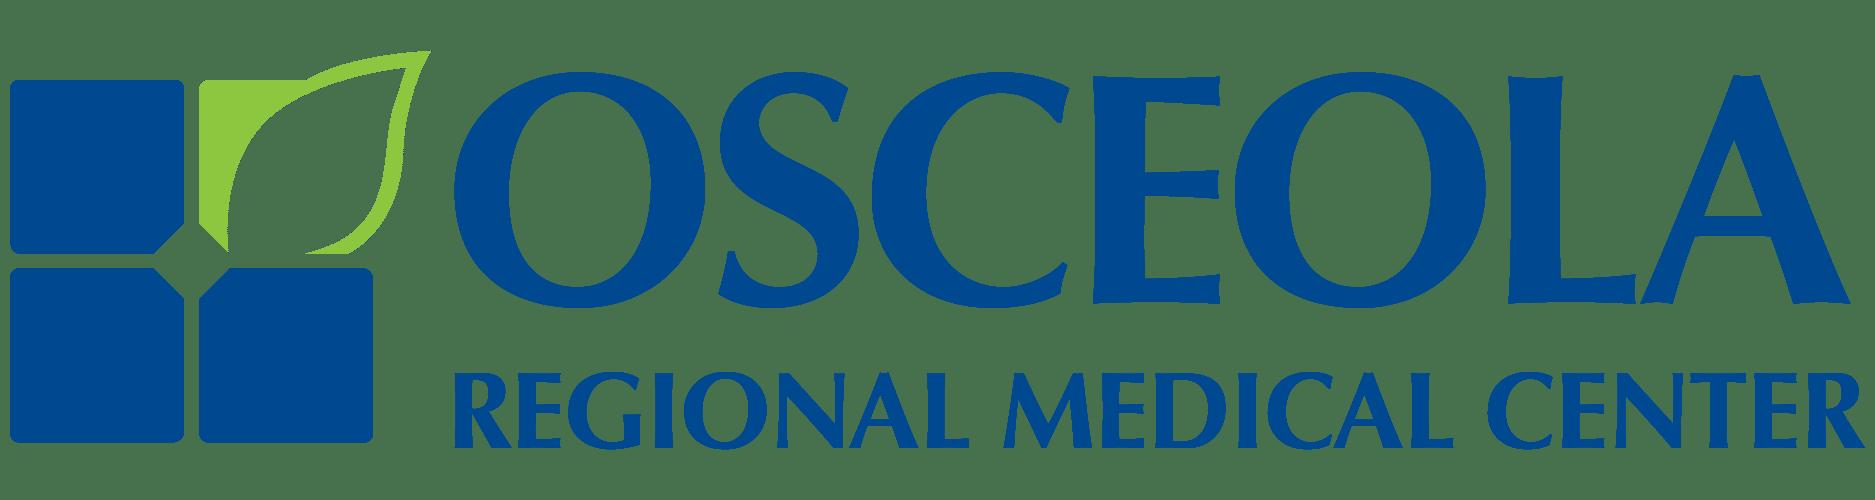 Osceola-Regional-Medical-Center_Color logo